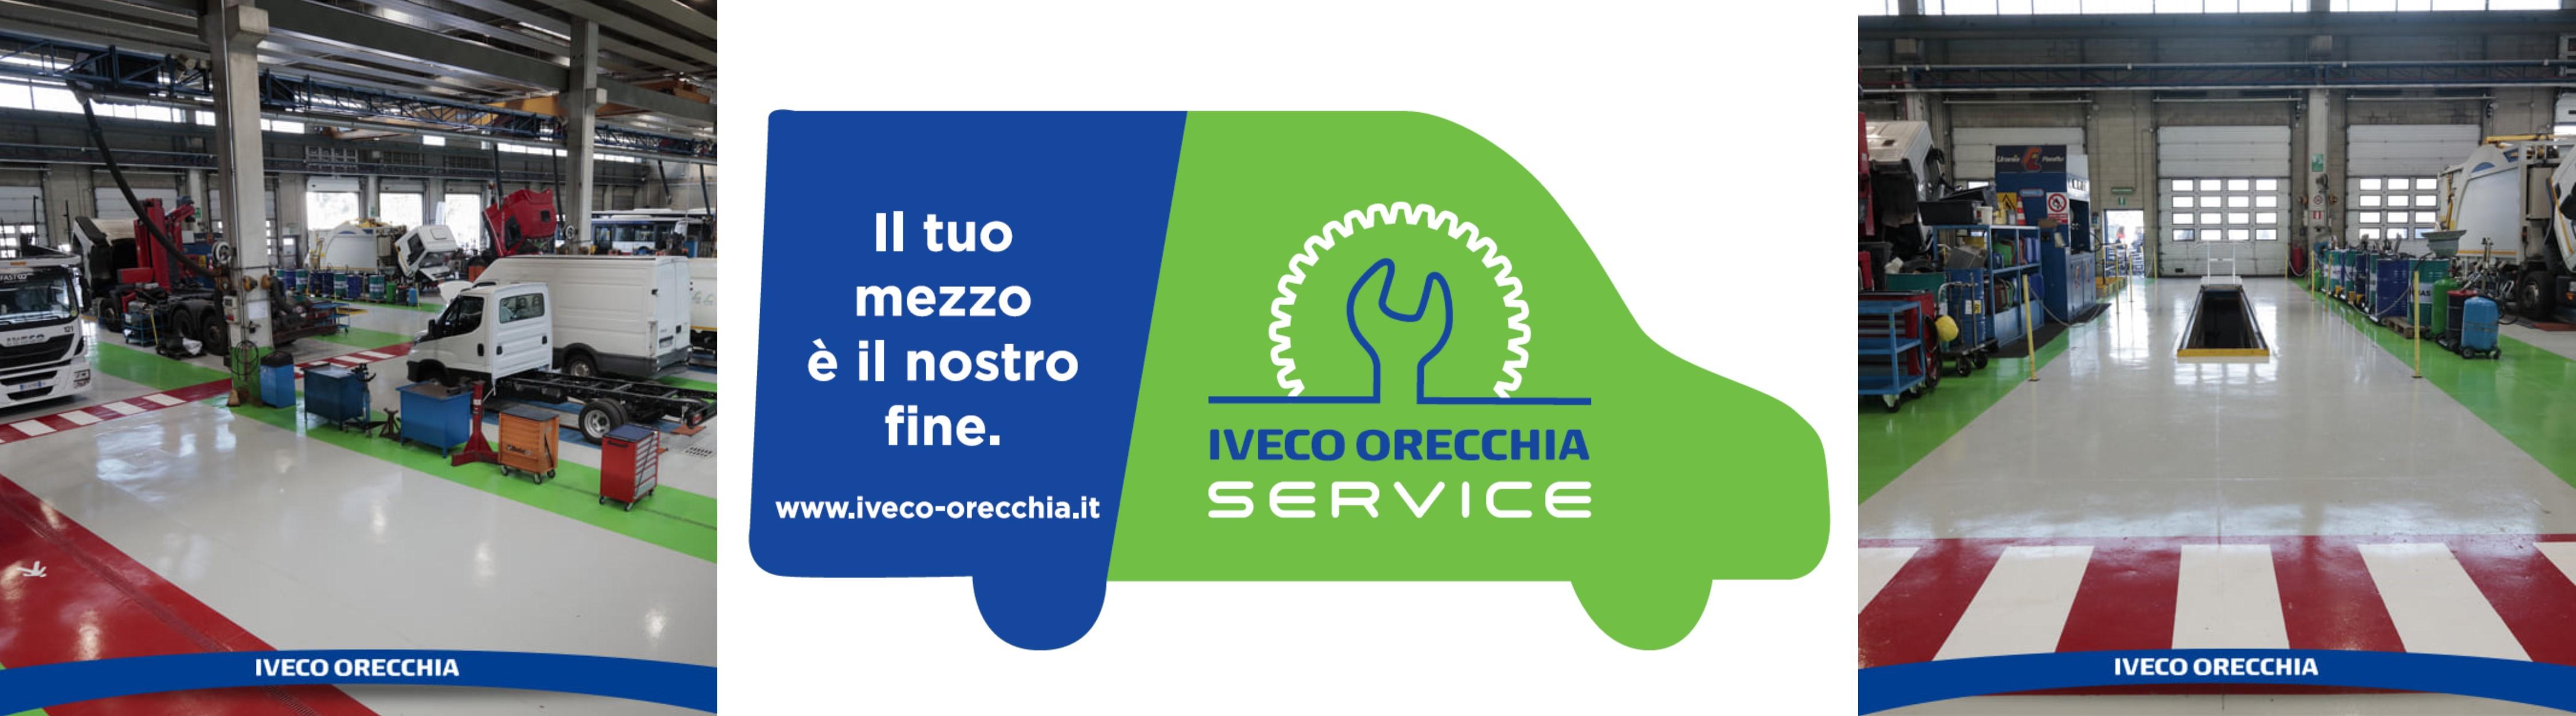 Iveco Orecchia officina: i nostri servizi